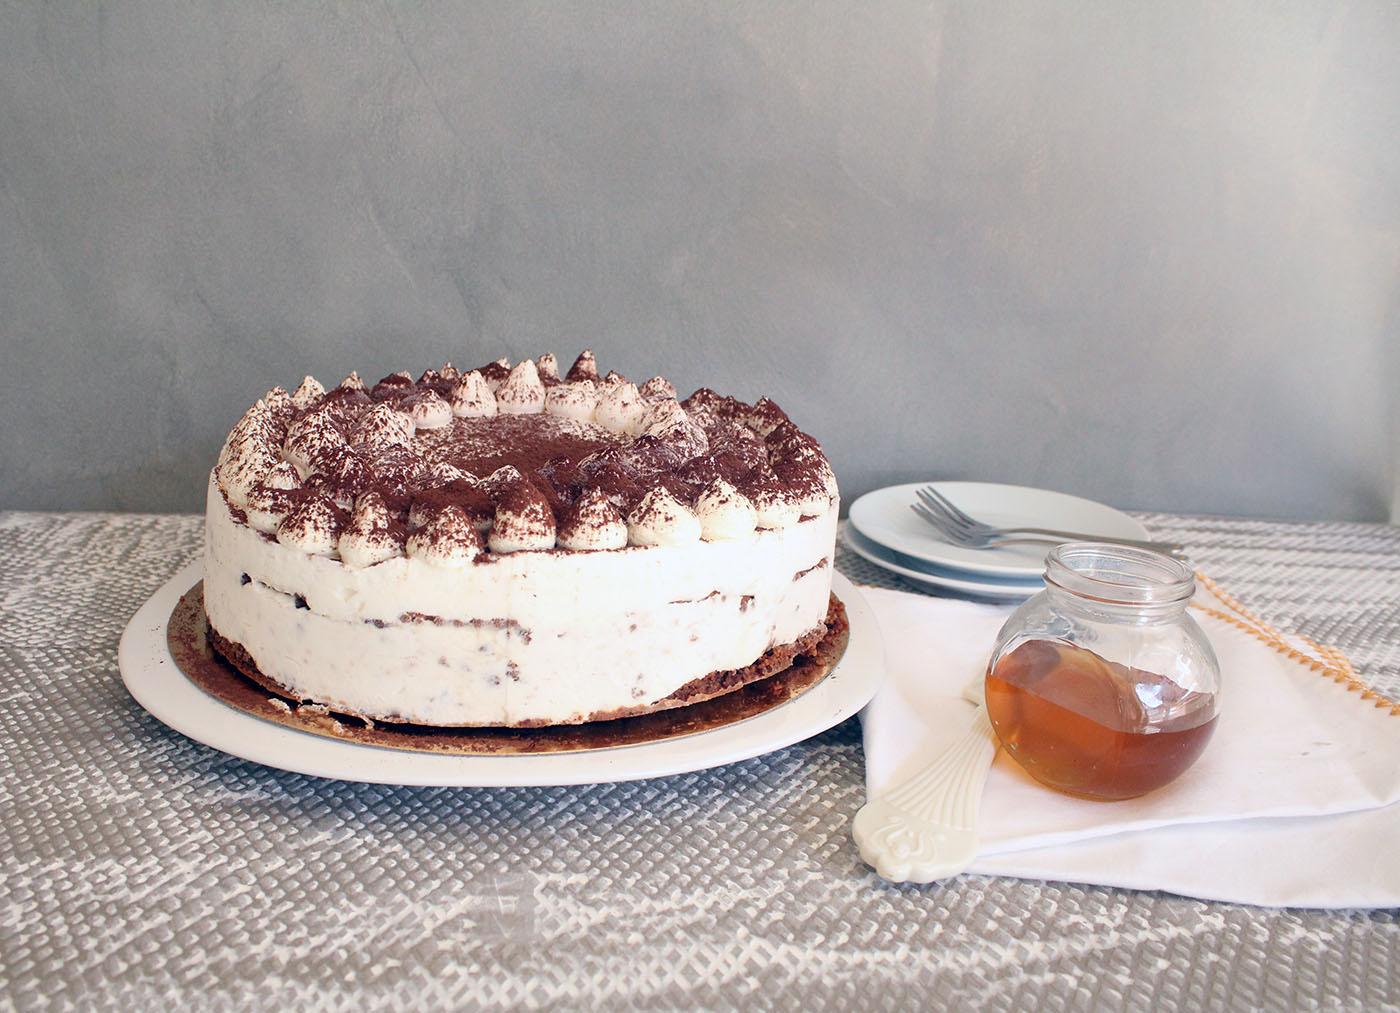 IMG 9735 - עוגת טרימיסו דבש ופקאן